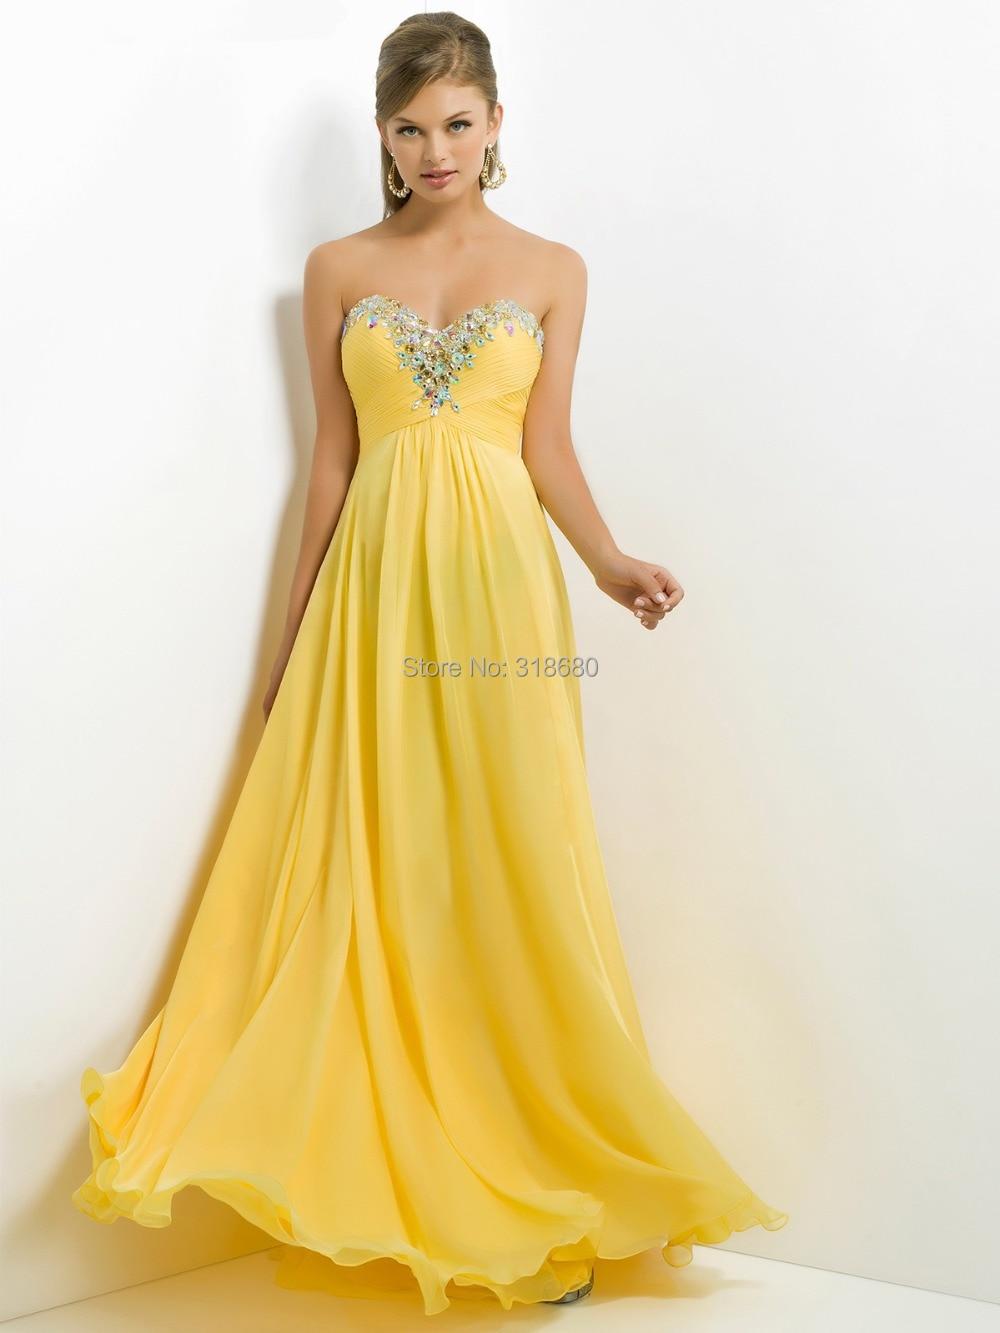 Custom Made A line Beaded Bustvestidos de fiesta long Pink Prom Dress Long  Party Dresses vestido gala Cheap Graduation Dress-in Prom Dresses from  Weddings ... aed4cb74c2f3